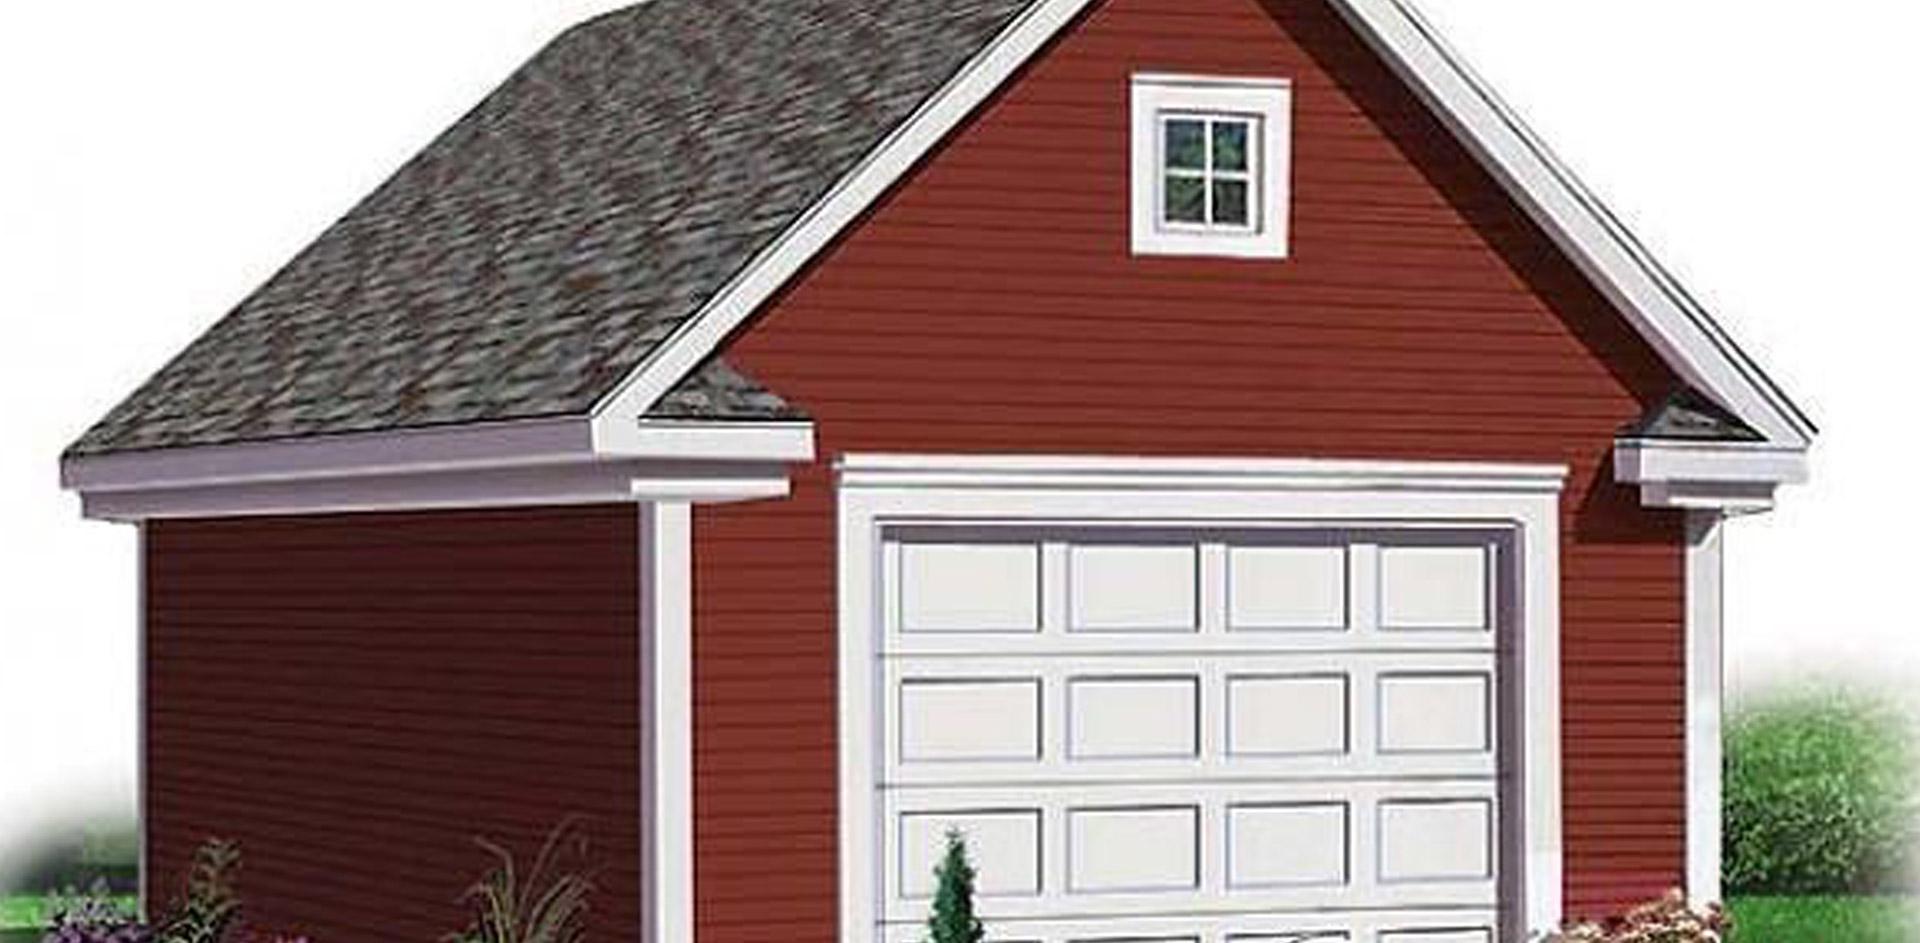 656 sq.ft. timber mart garage